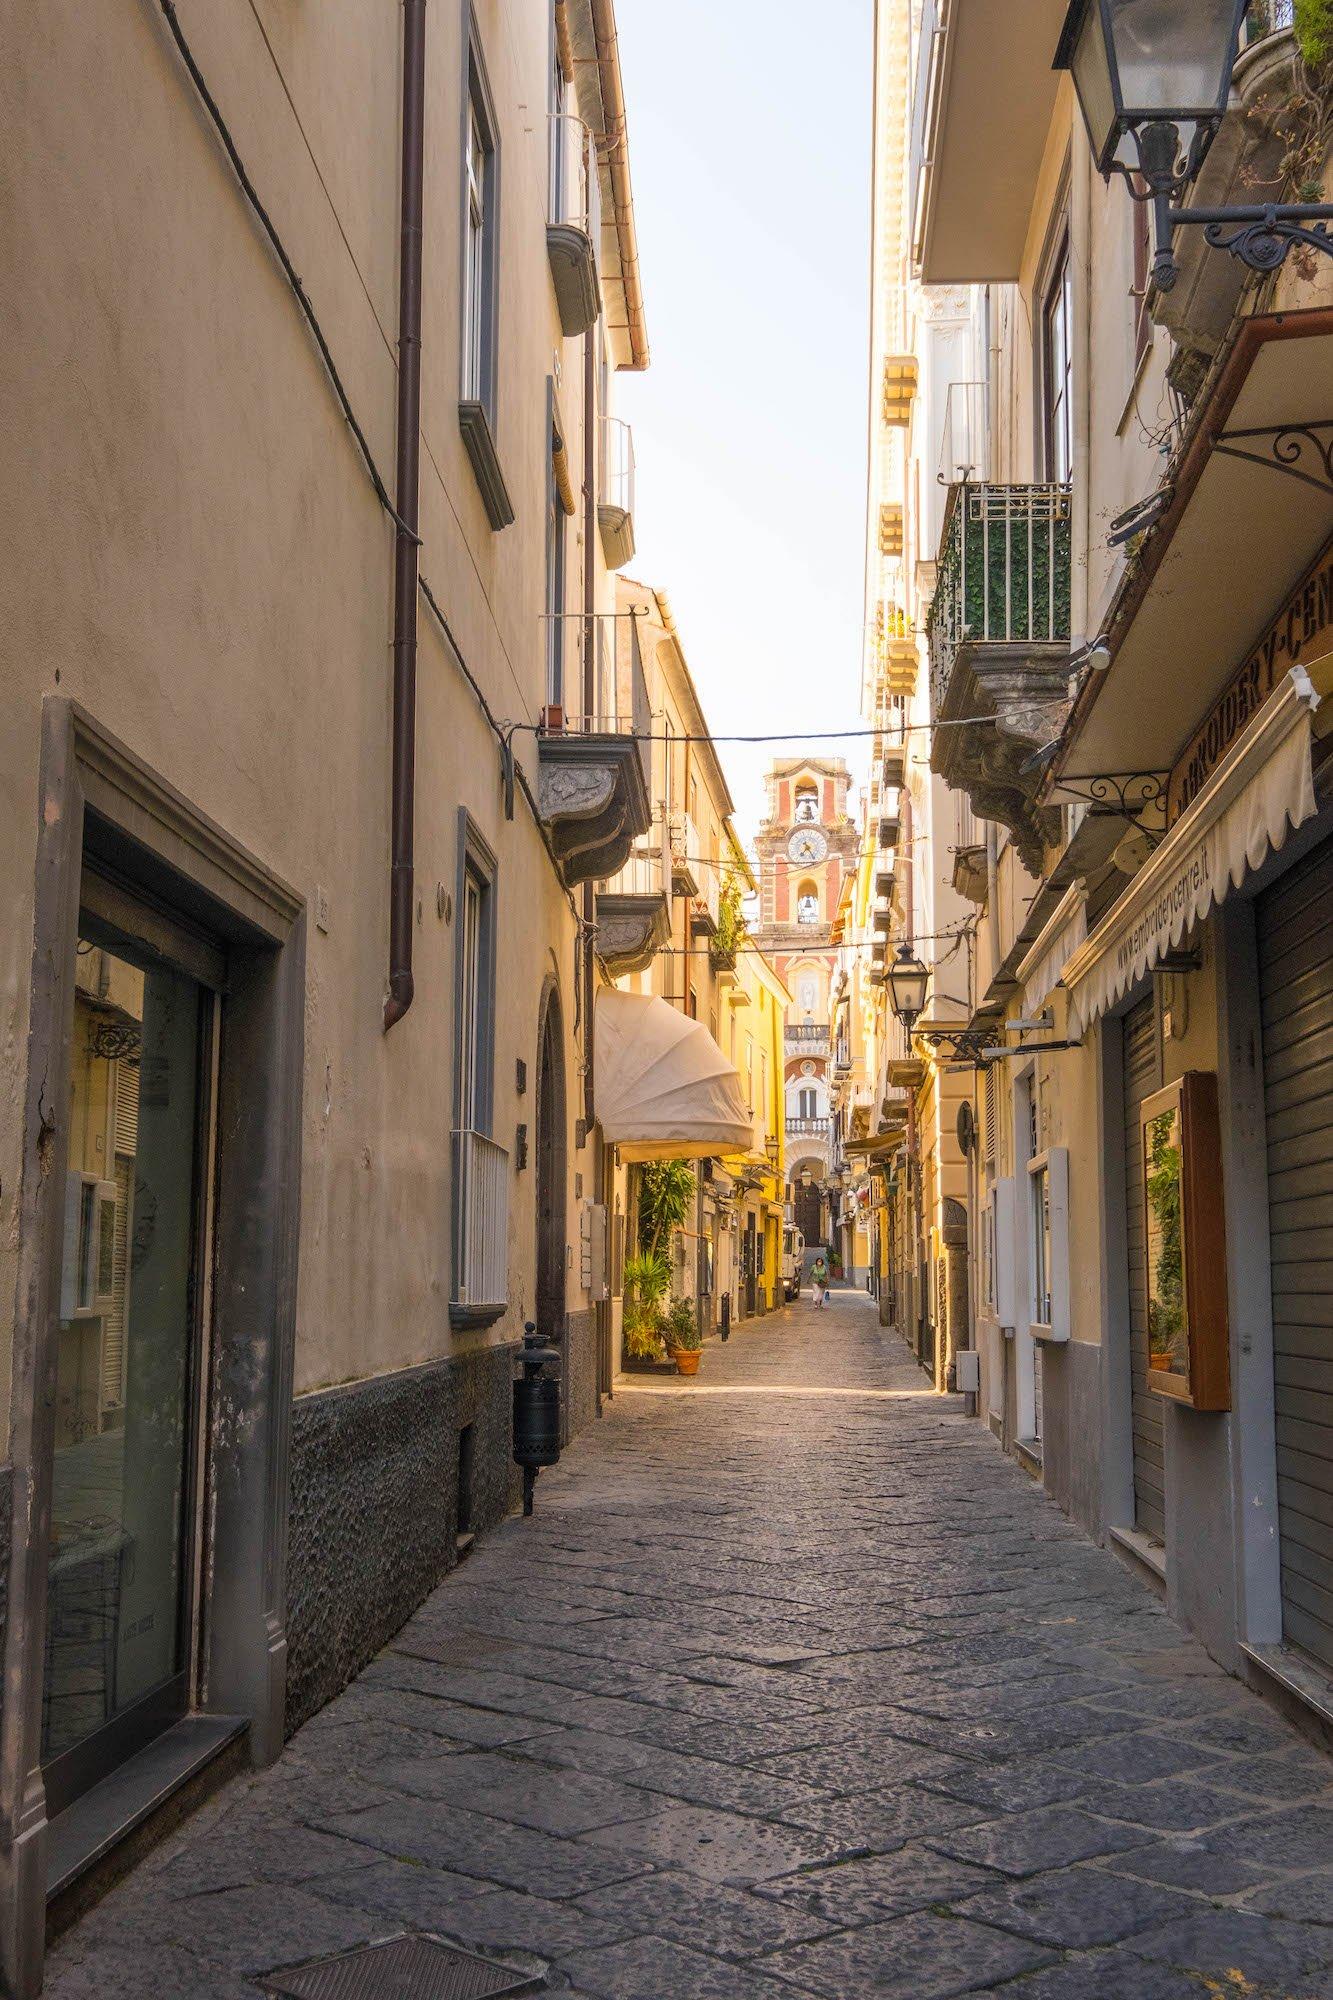 Sorrento Street leads to Basilica of San Antonino.